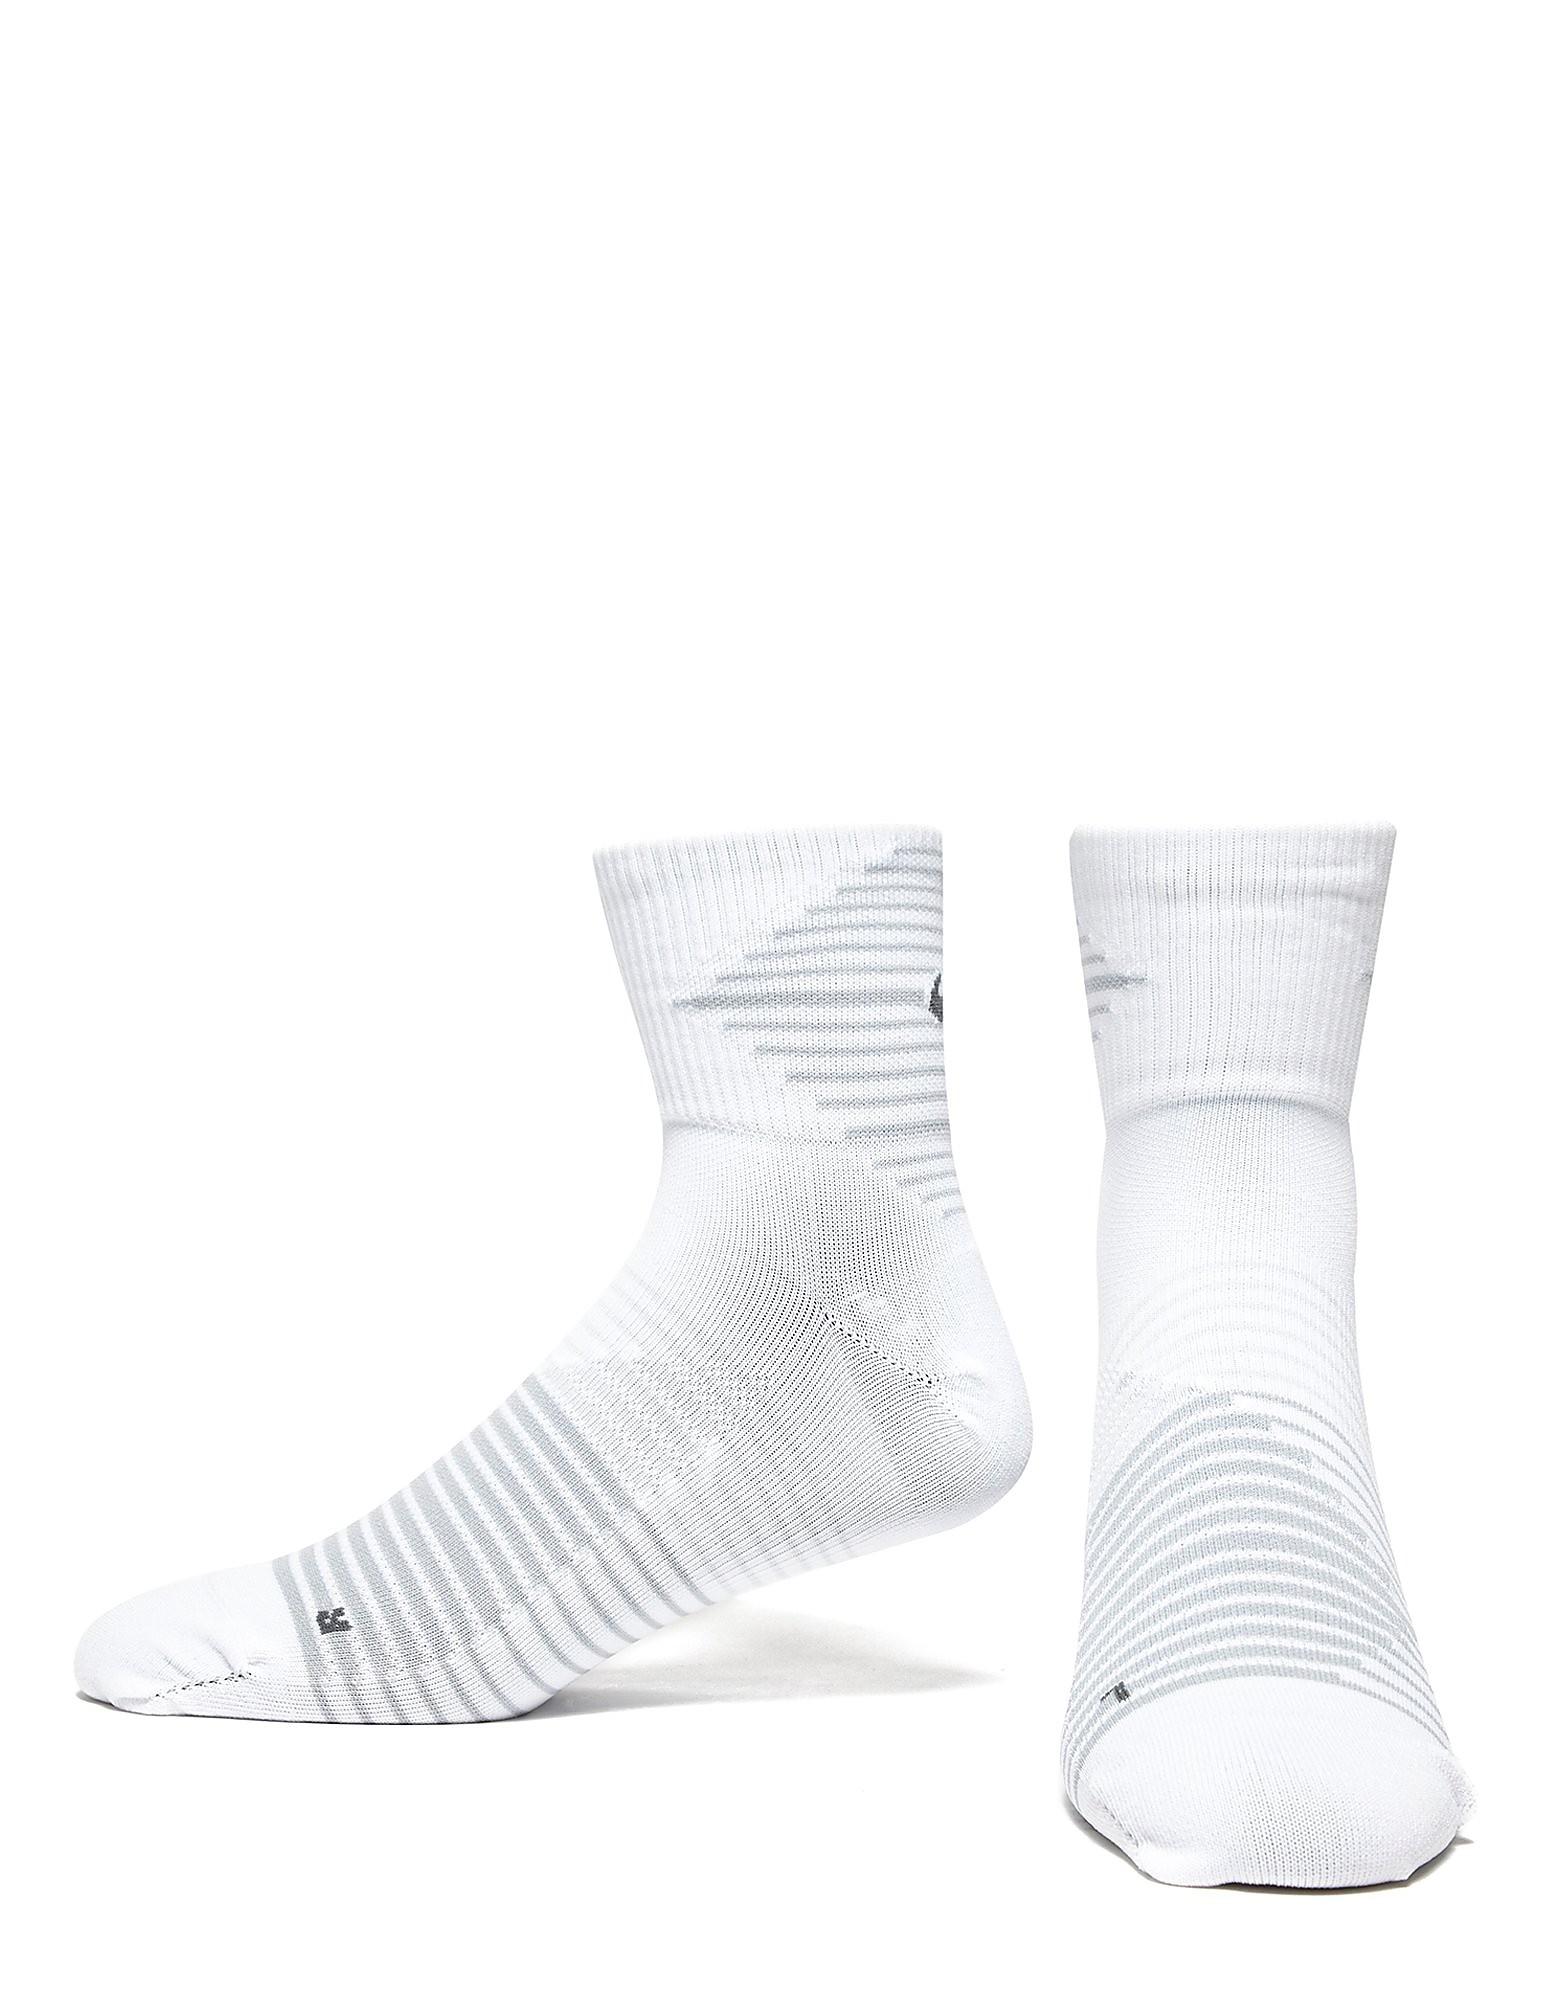 Nike Performance Lightweight Quarter Running Socks